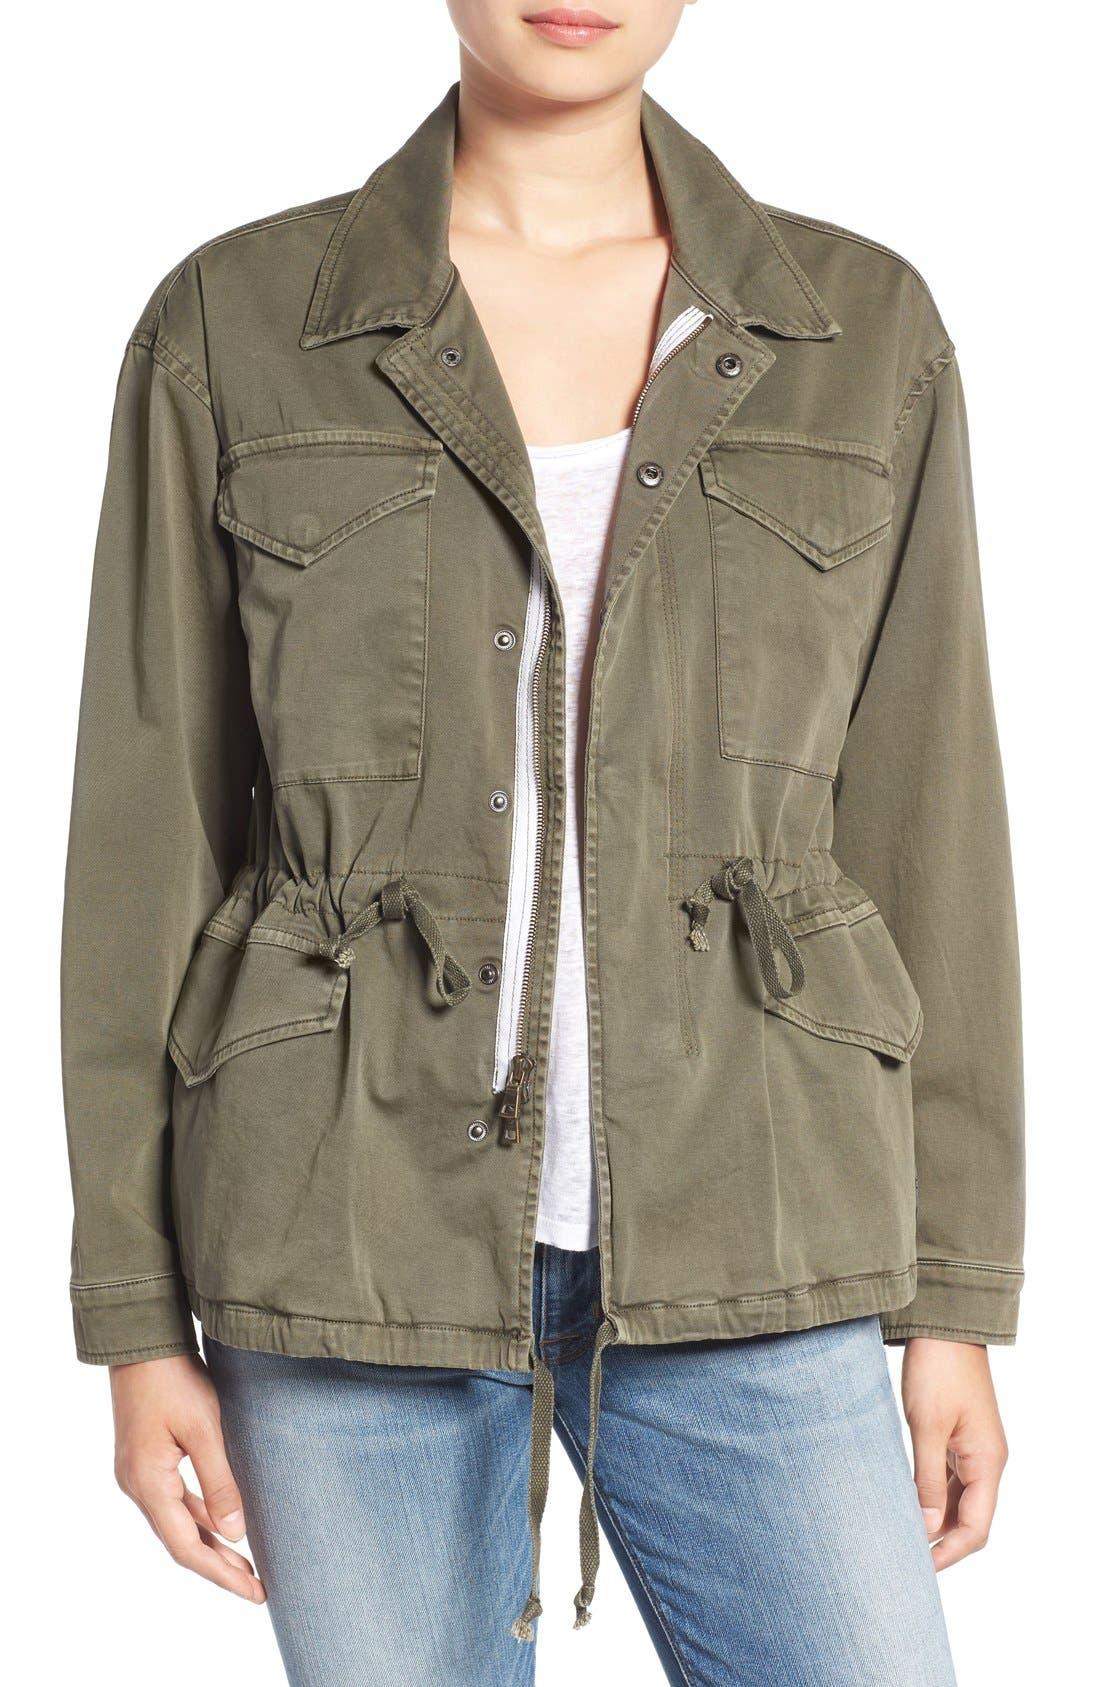 HUDSON JEANS Sienna Stretch Cotton Field Jacket